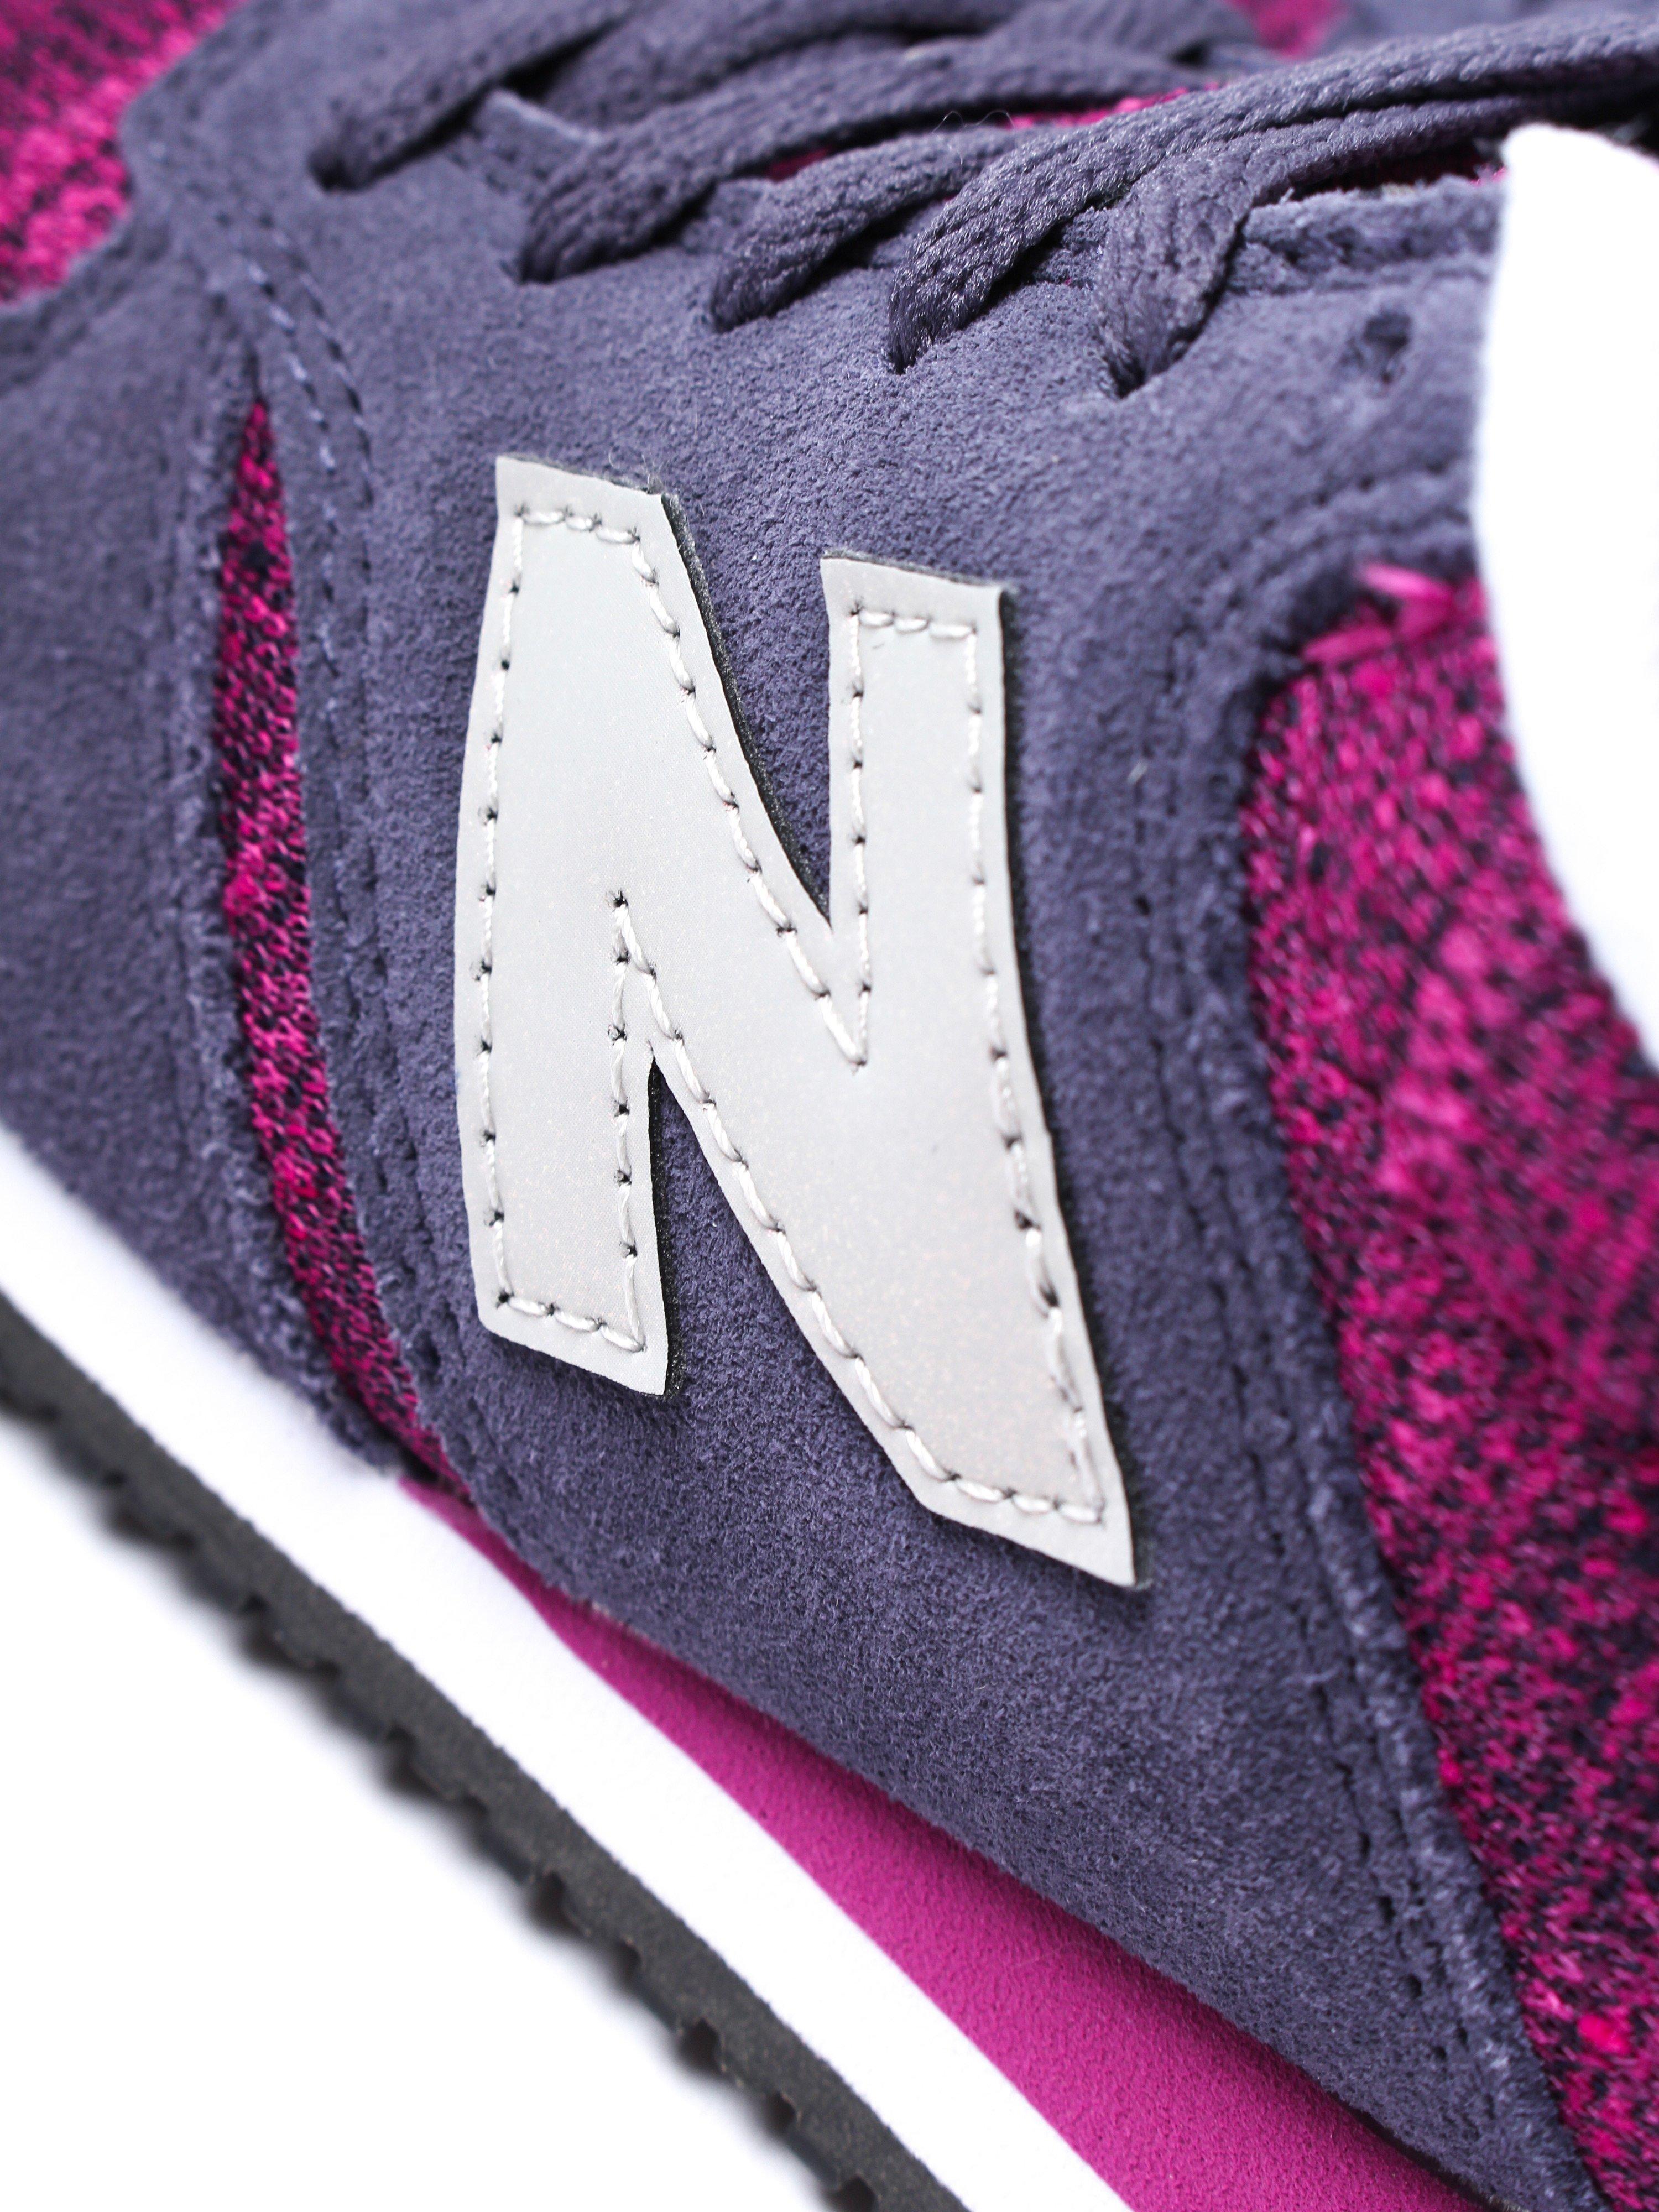 New Balance Women's 420 Low Top Trainers - Navy & Burgundy